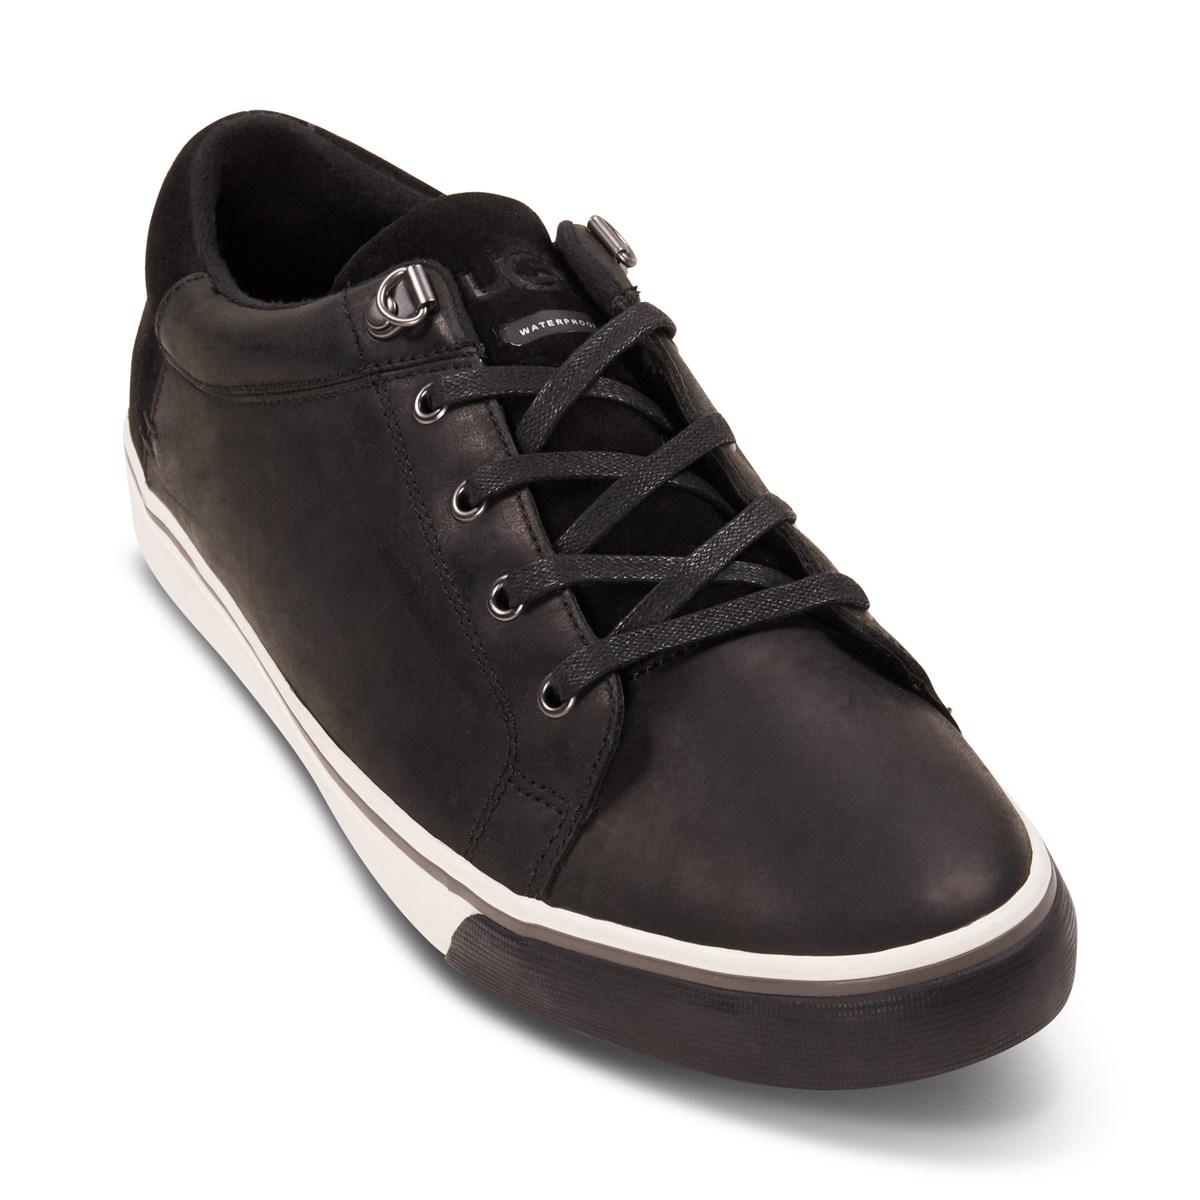 72cce4a2820 Men s Brock II Waterproof Sneakers in Black